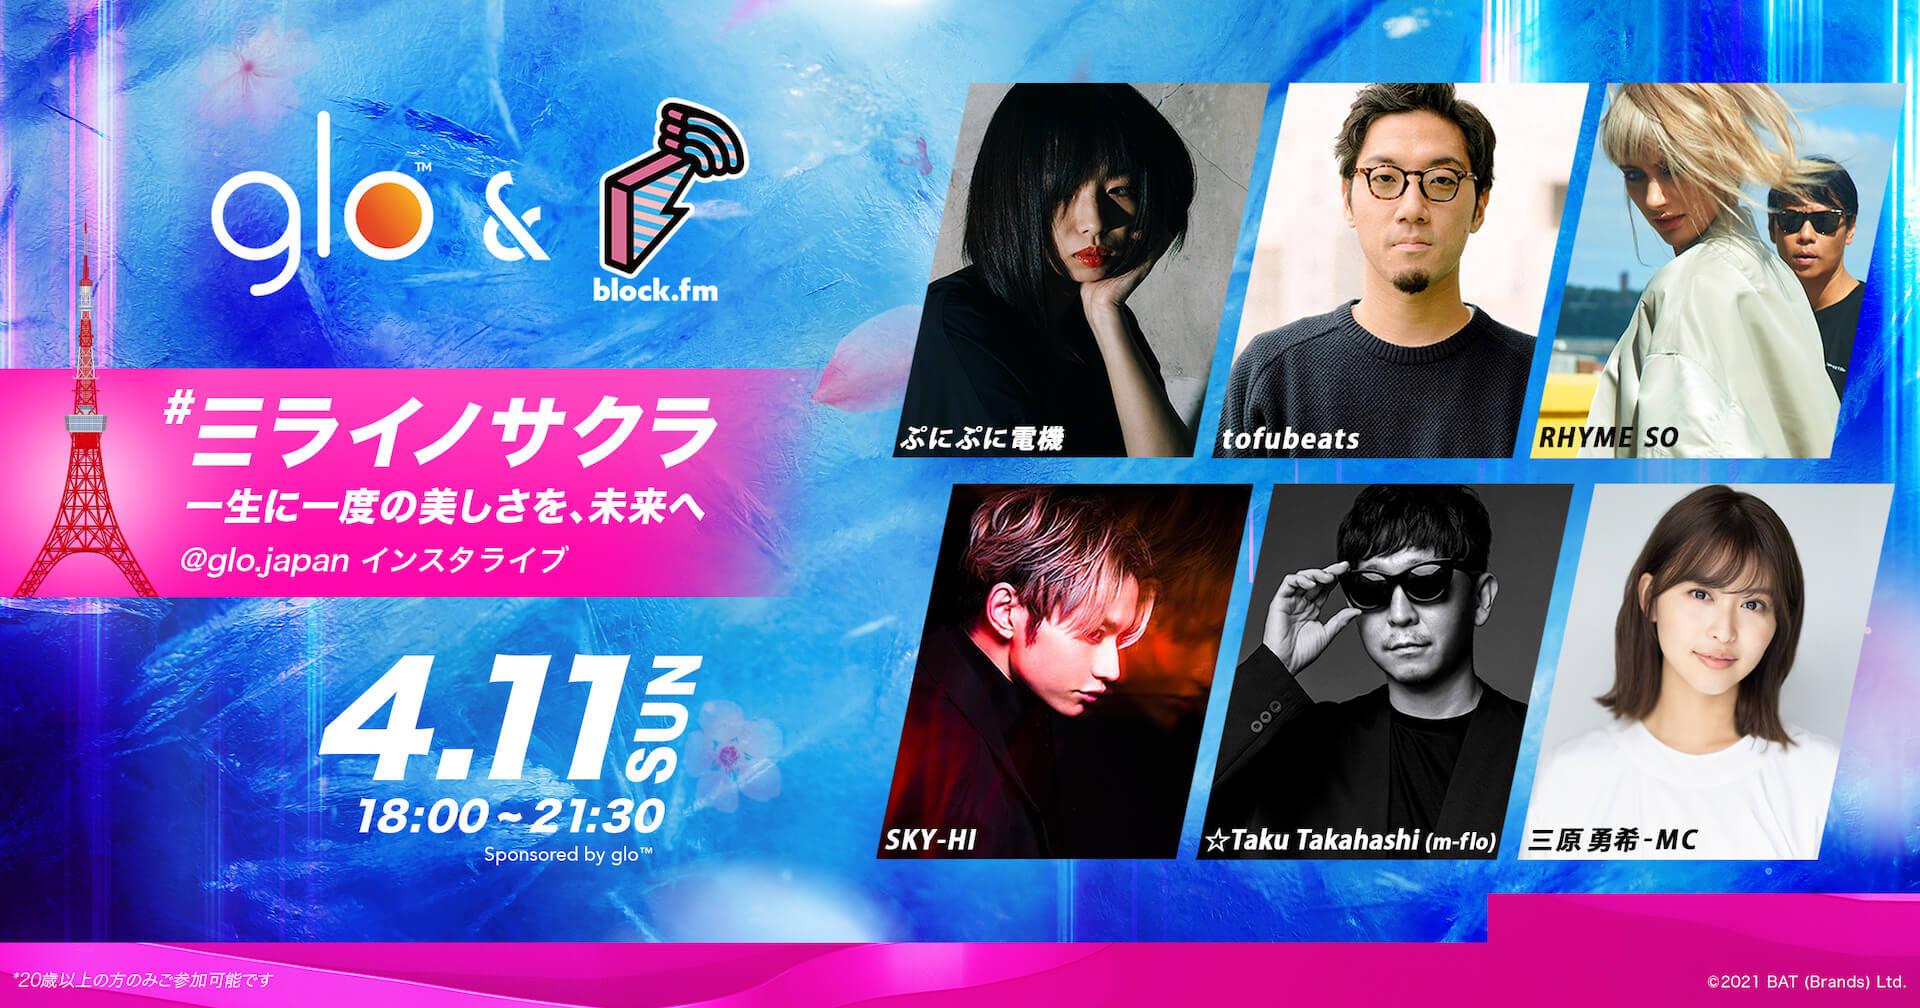 gloとblock.fmによるIGライブ「#ミライノサクラ」が開催決定!SKY-HI、☆Taku Takahashi、tofubeatsらが桜色のステージでライブ music210406_glo-blockfm-210406_4